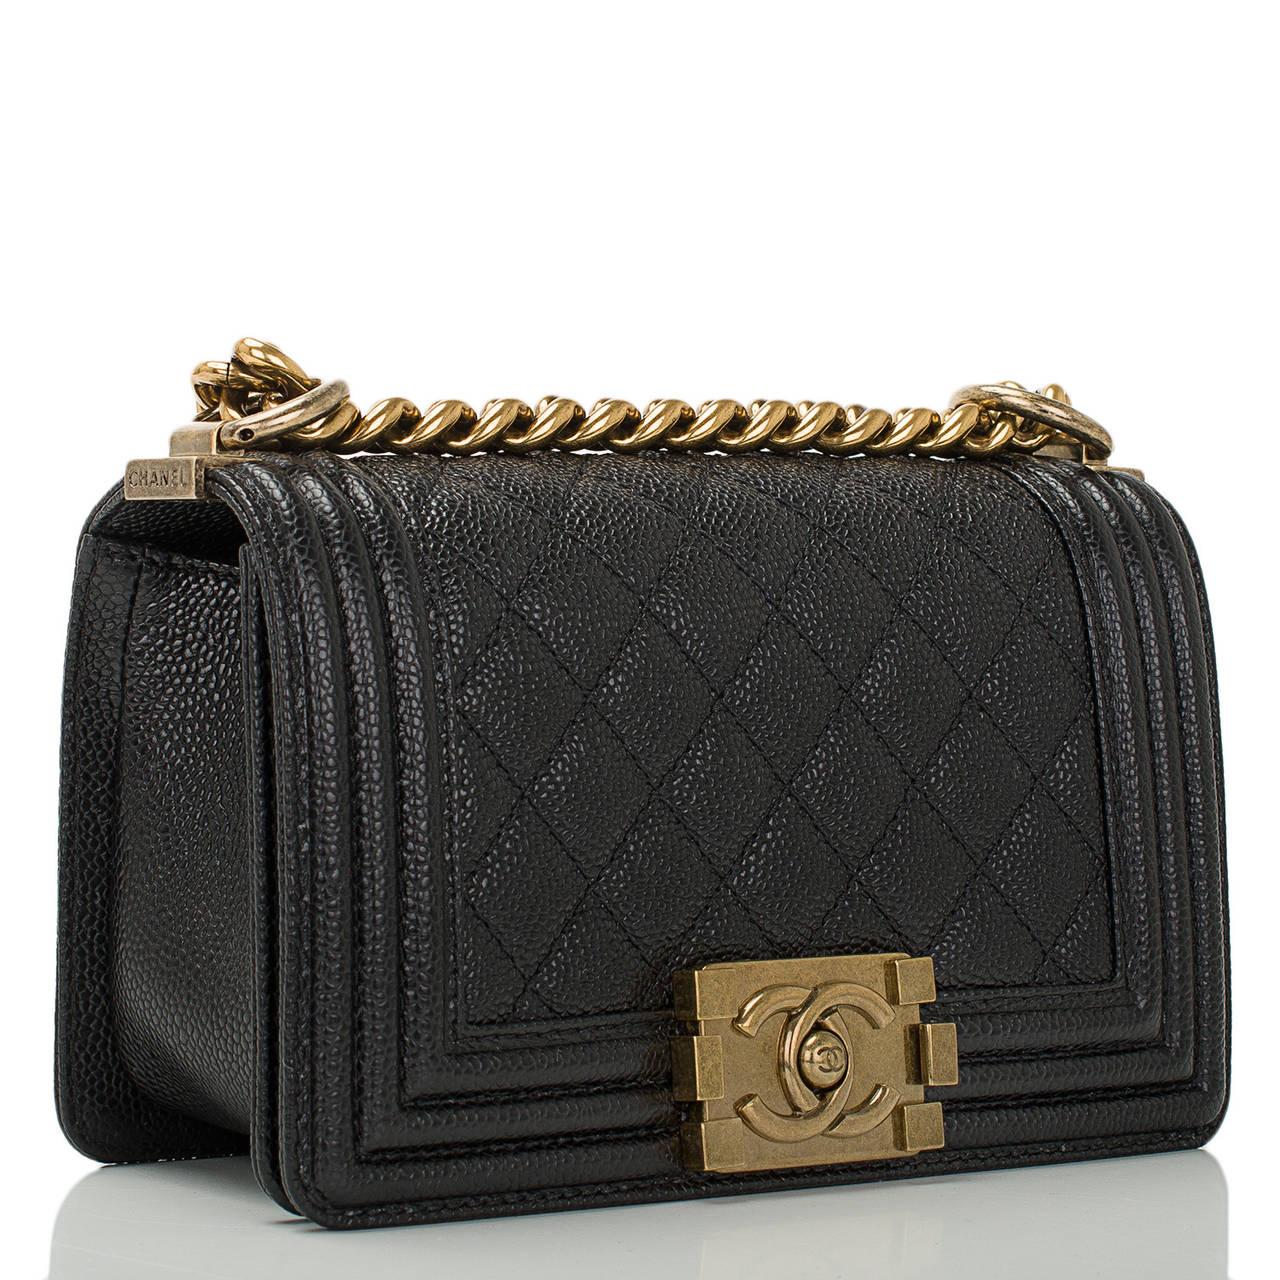 Replica chanel classic tweed flap bag